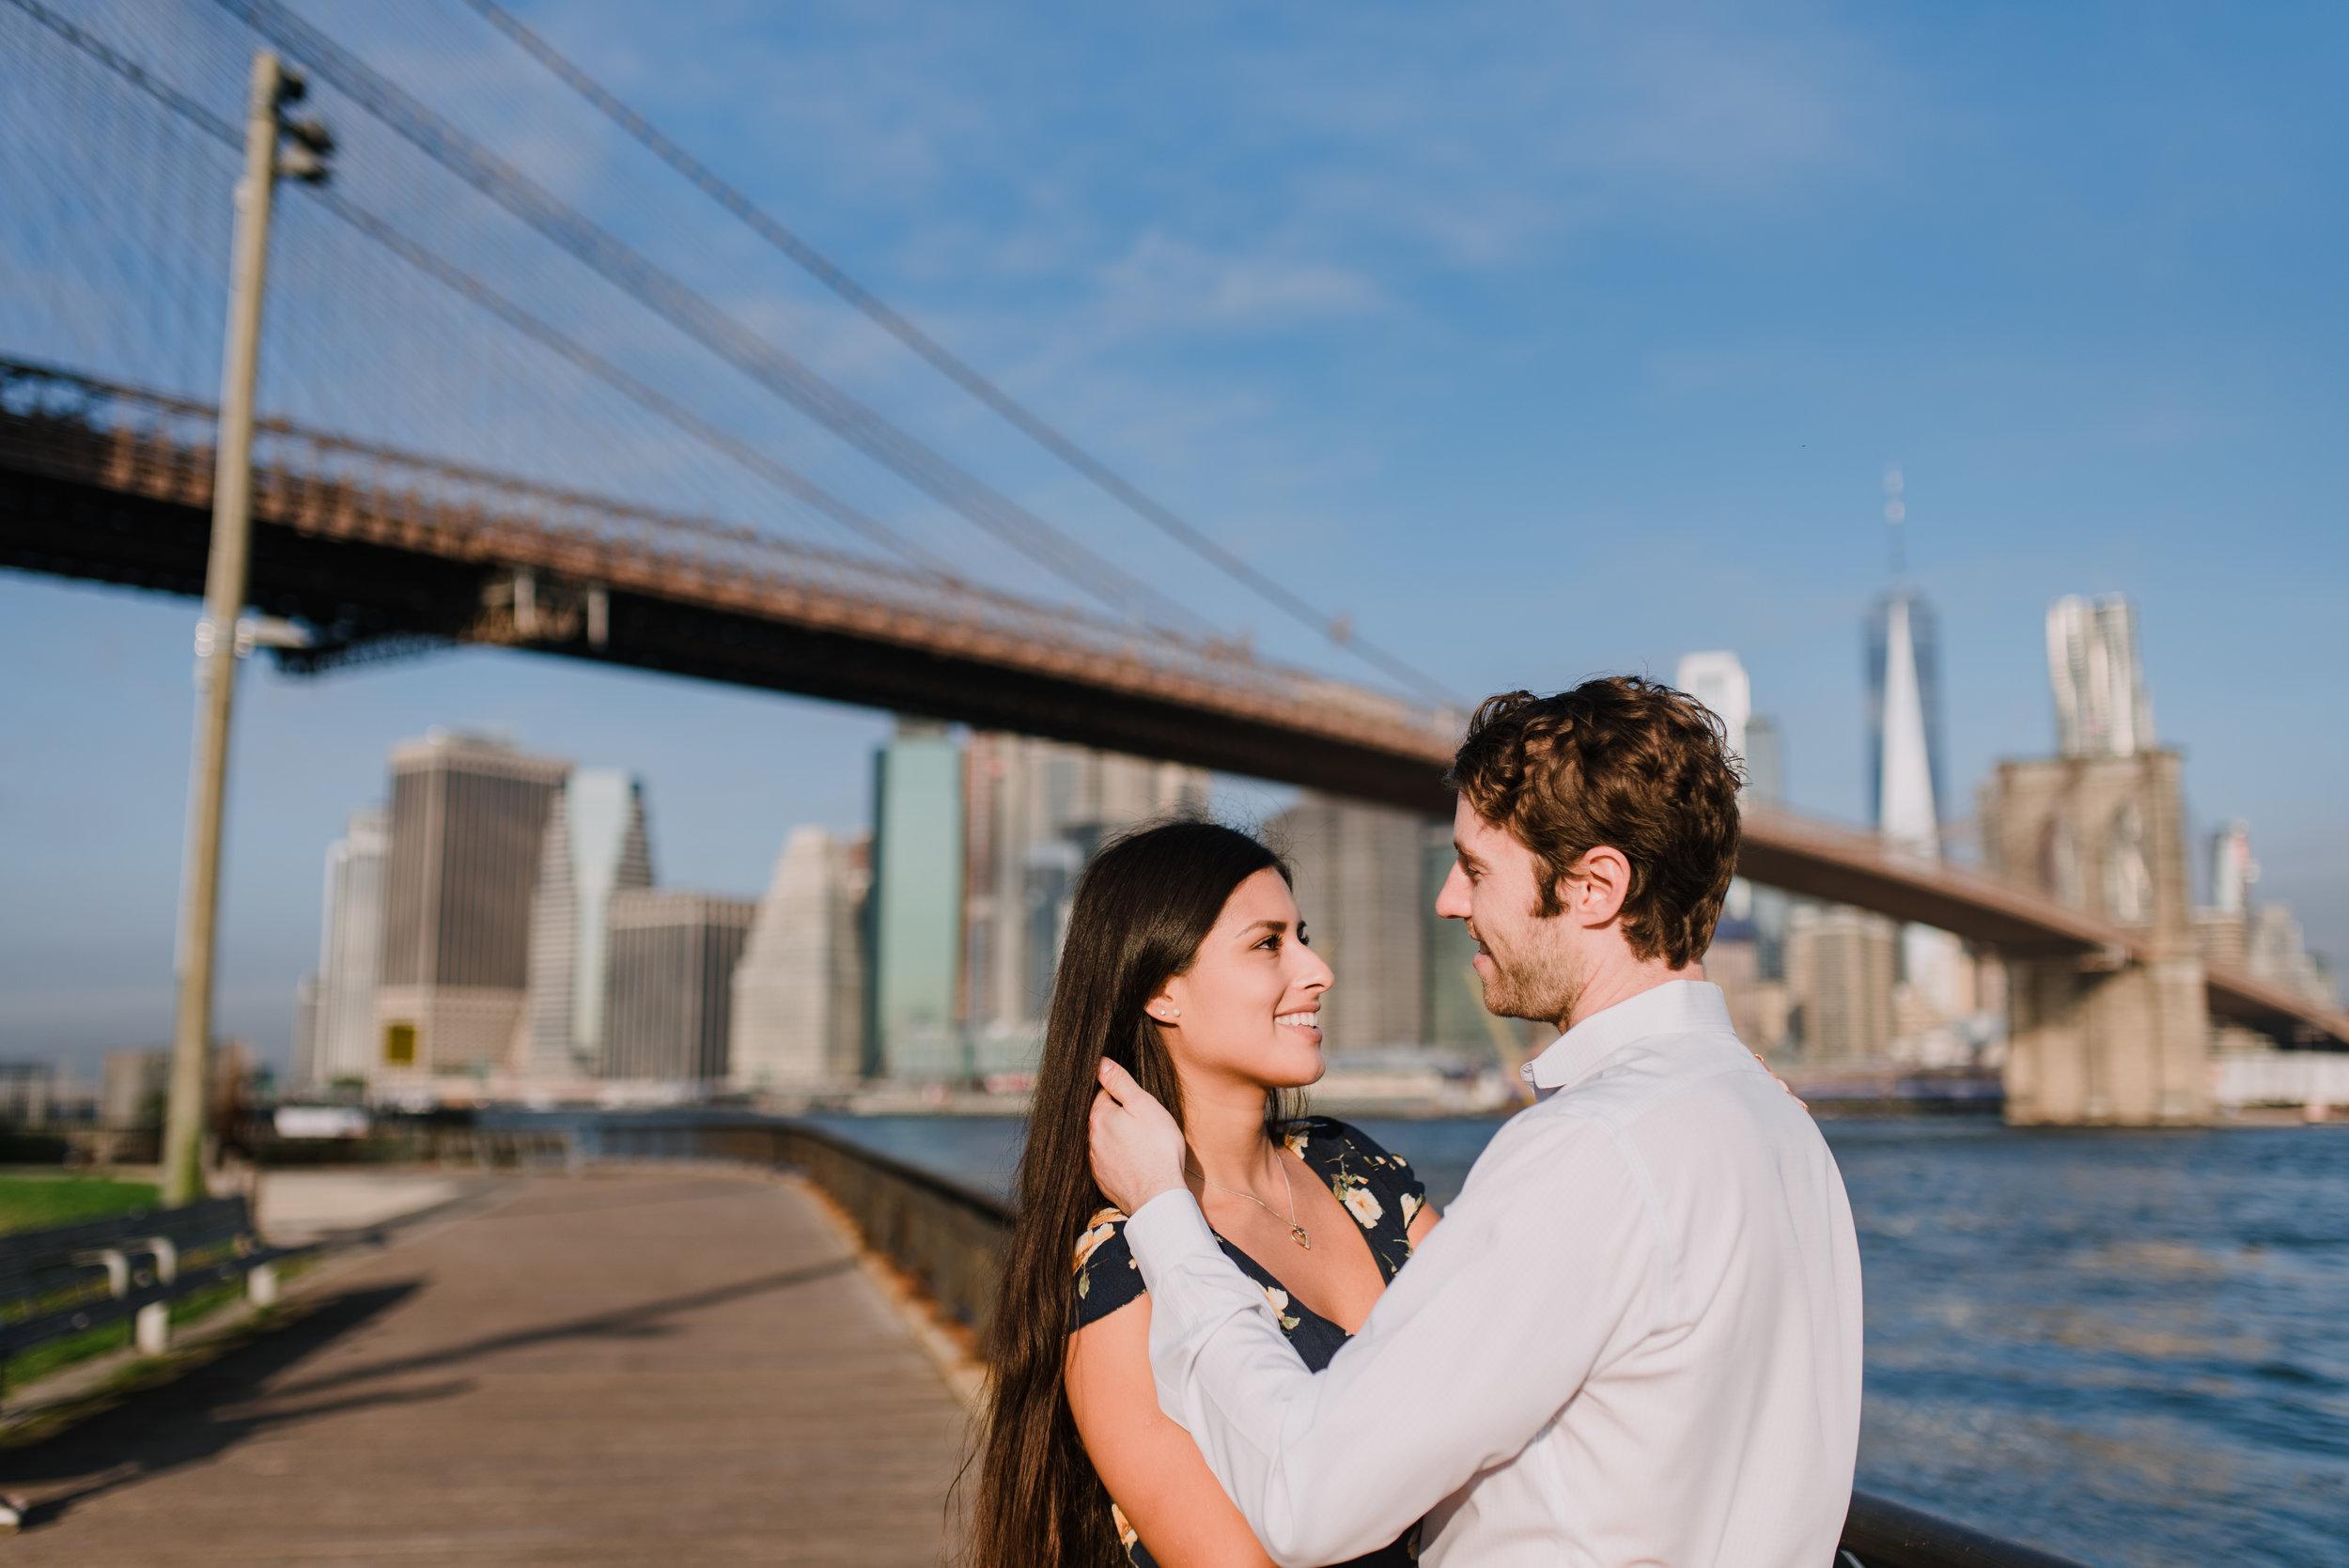 brooklyn bridge engagement shoot, couple shoot nyc, nyc wedding photographer, destination wedding photographer, documentary wedding photographer in nyc (26).jpg